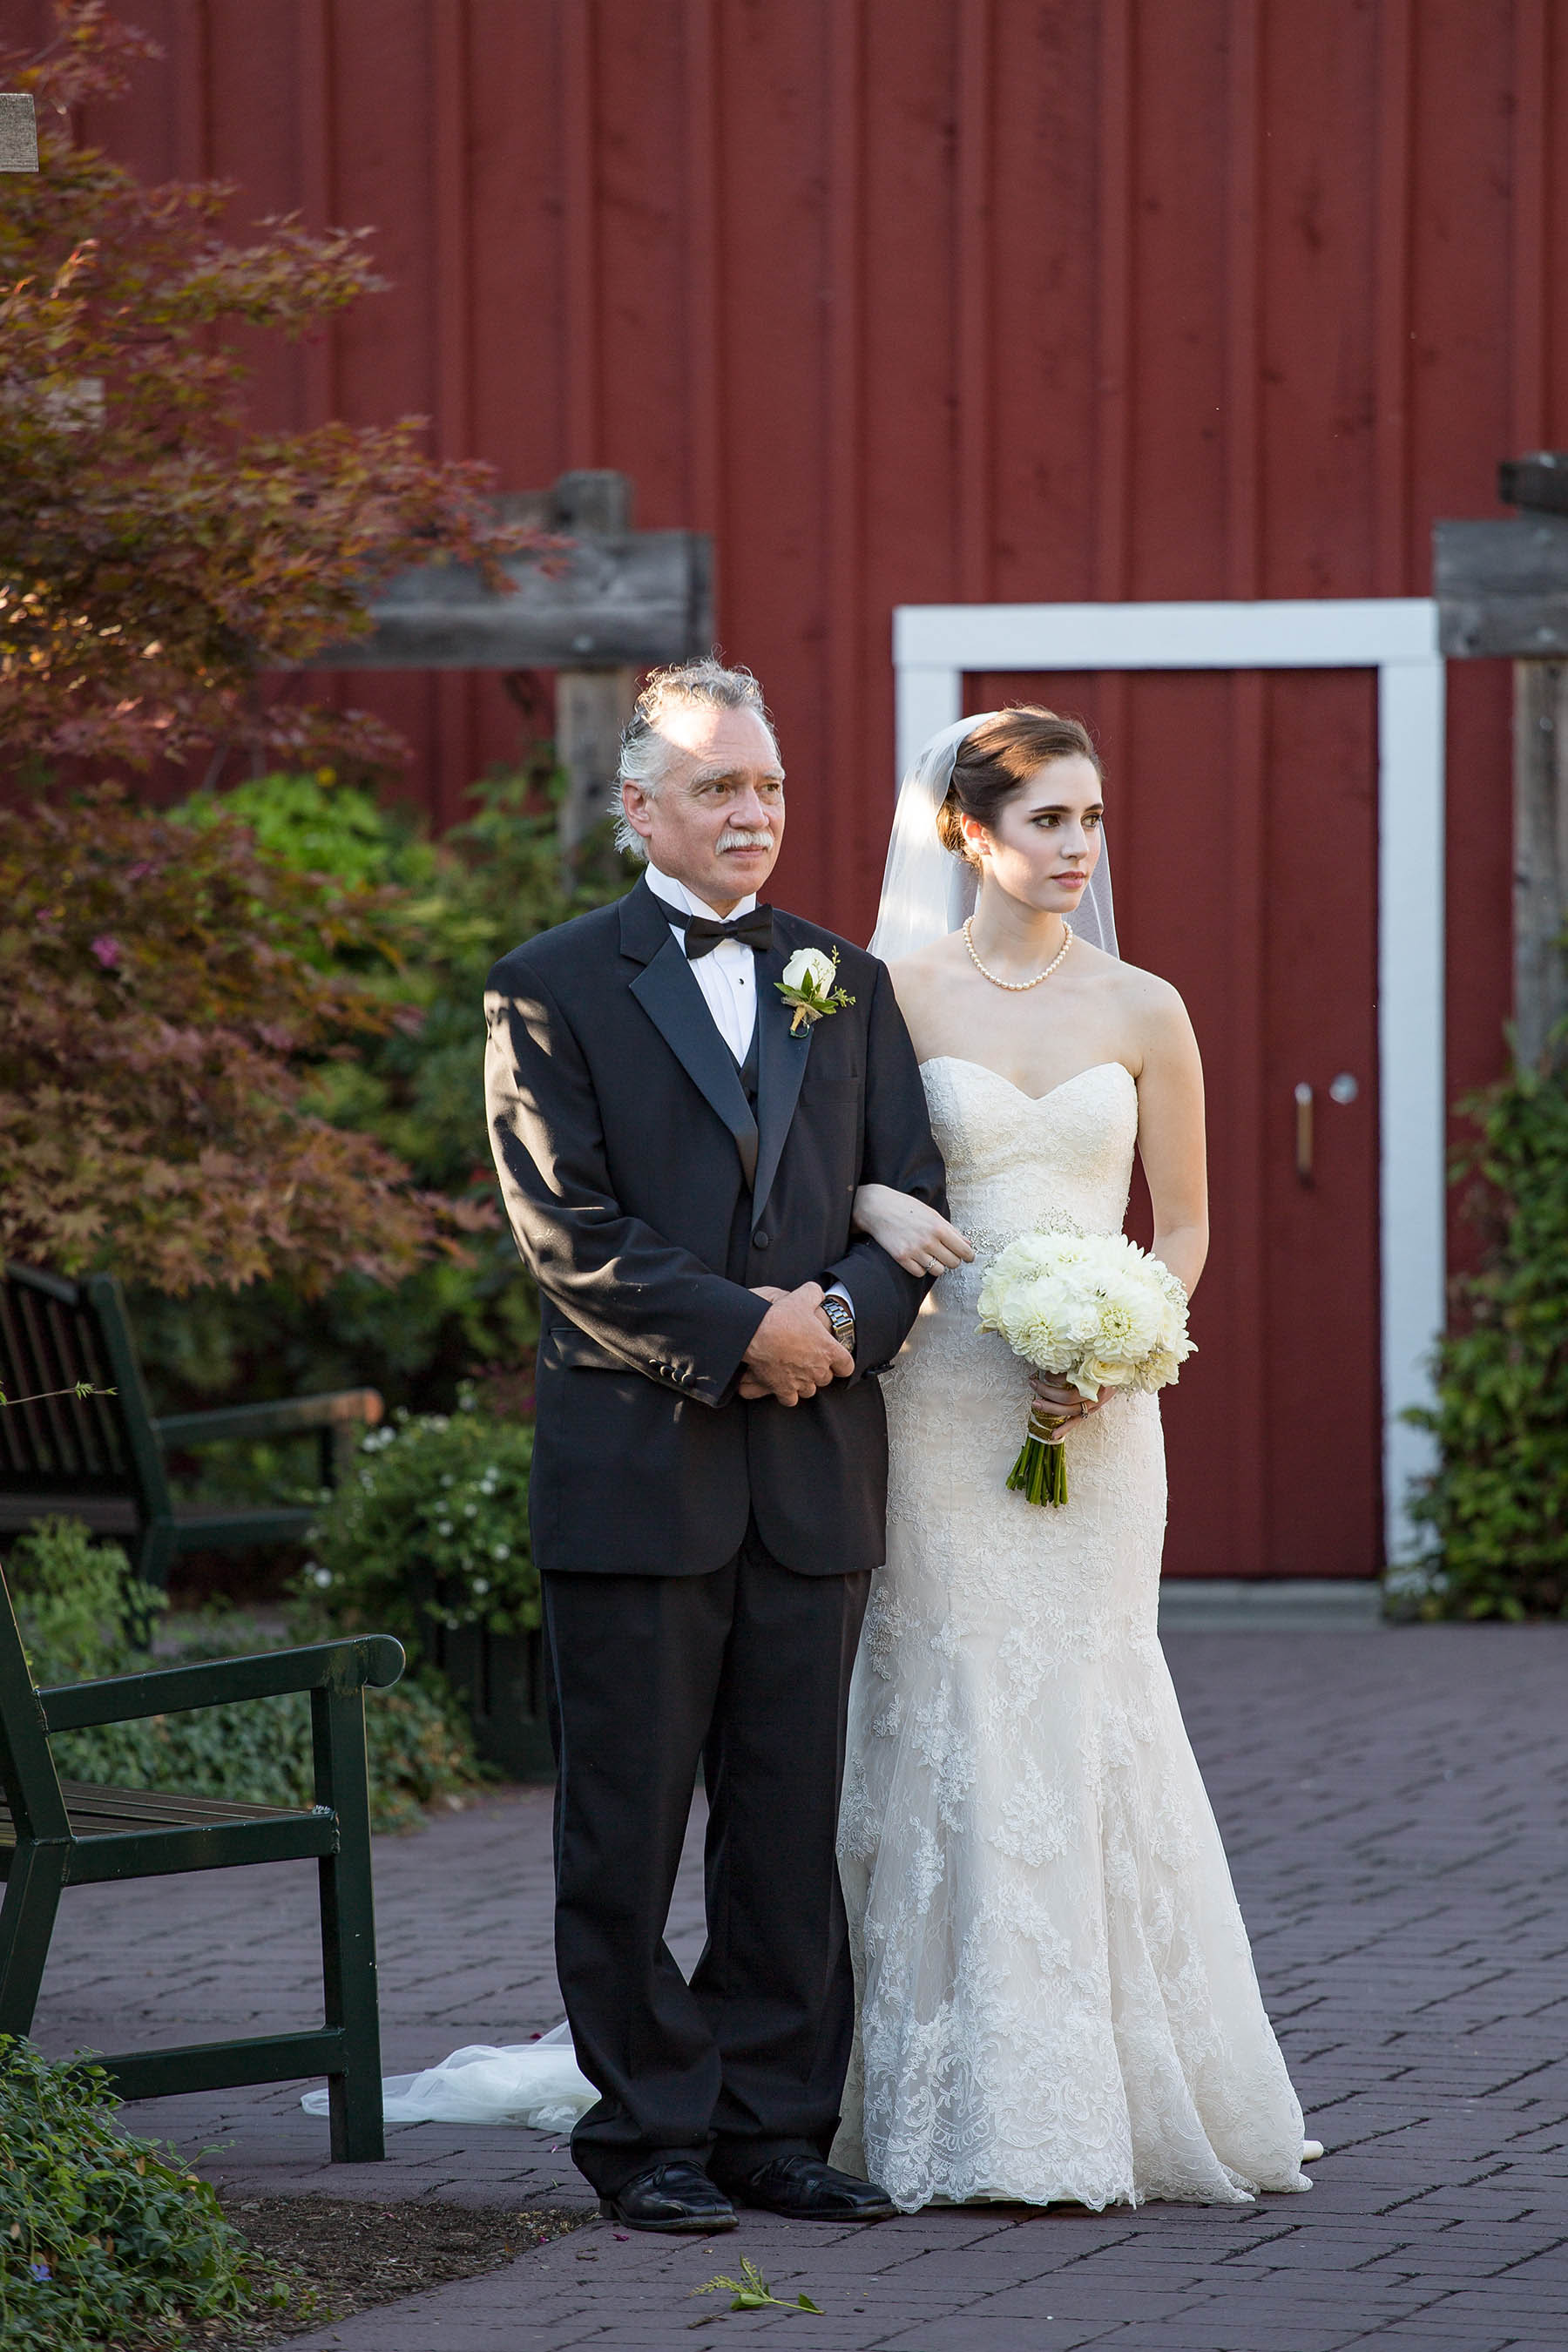 pickering-barn-issaquah-wedding-photography006.jpg